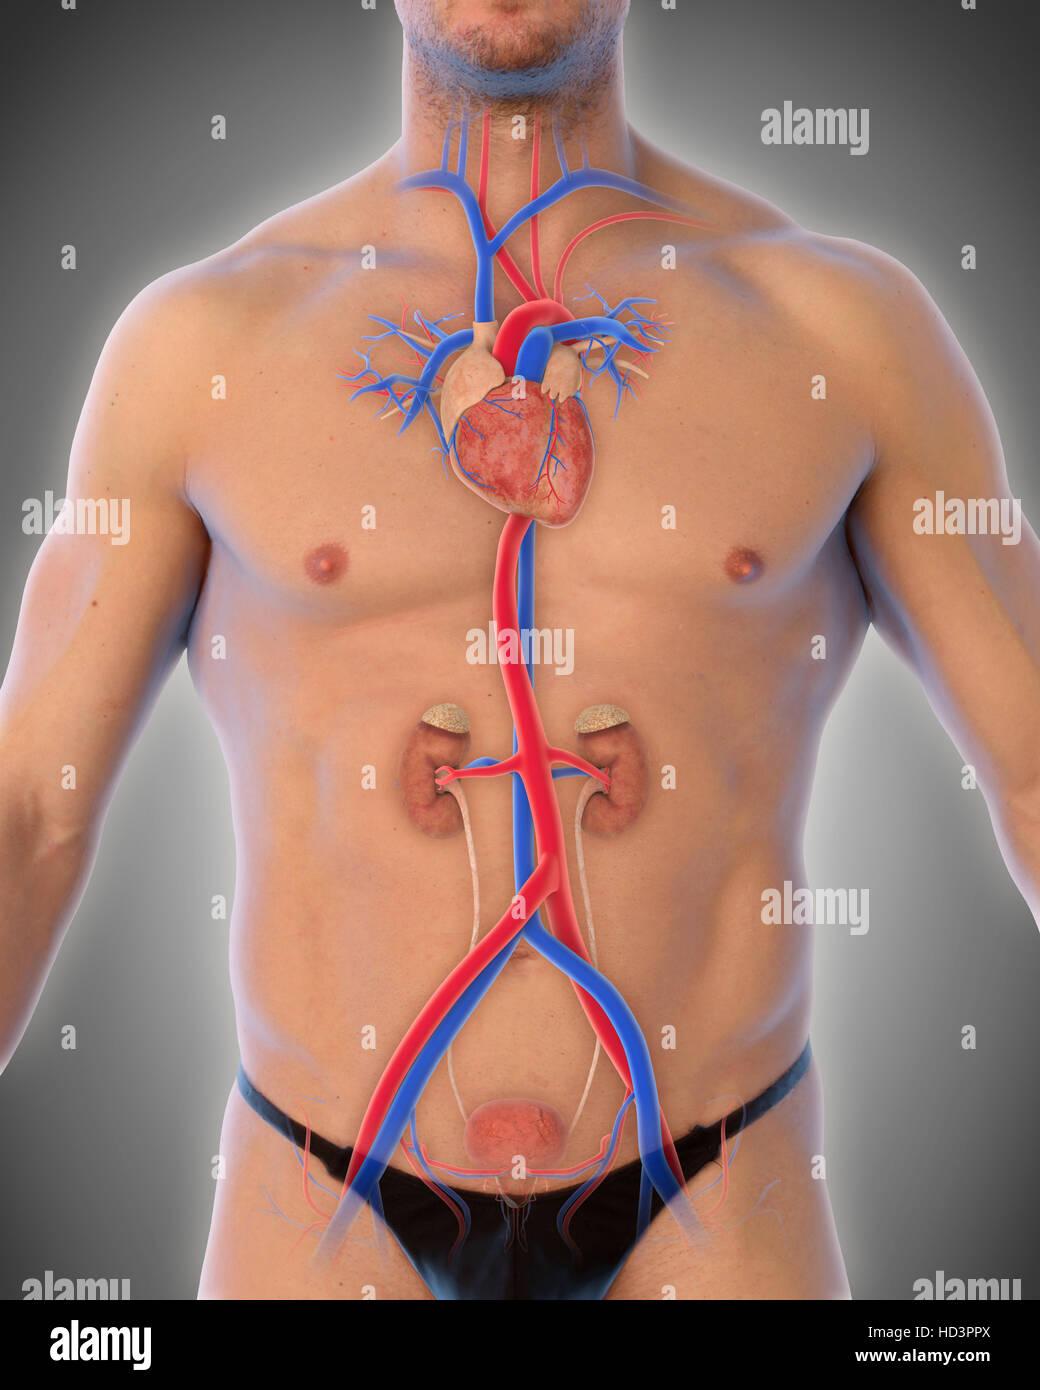 Human Thoracic Aorta - Stock Image